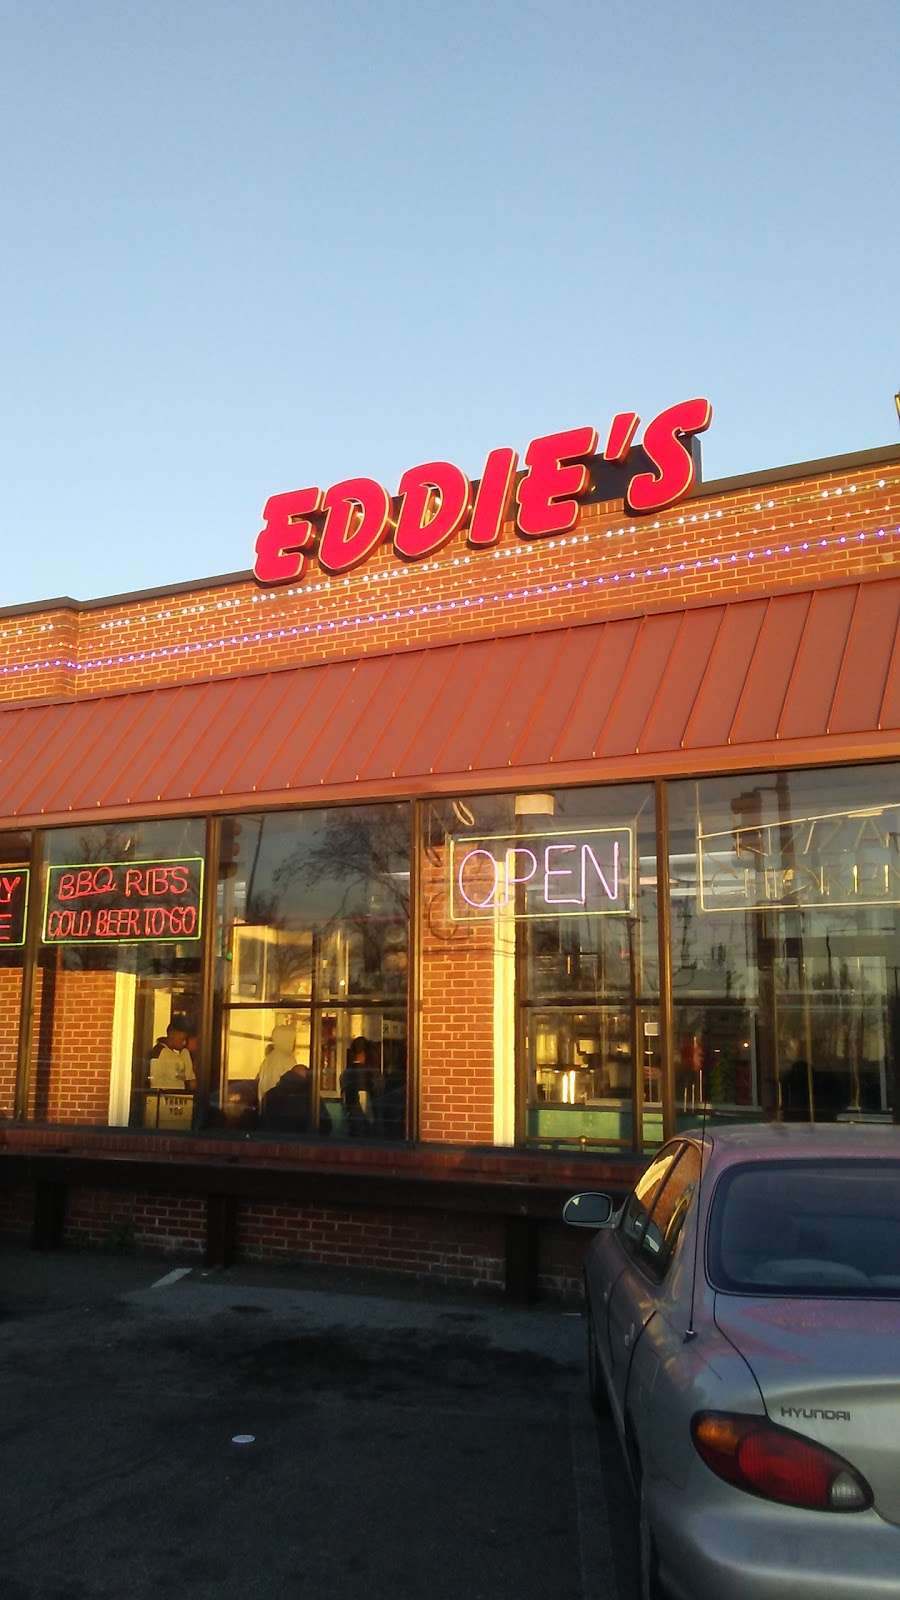 Eddies Carry Out - meal takeaway    Photo 7 of 10   Address: 1251 Bladensburg Rd NE, Washington, DC 20002, USA   Phone: (202) 399-1725